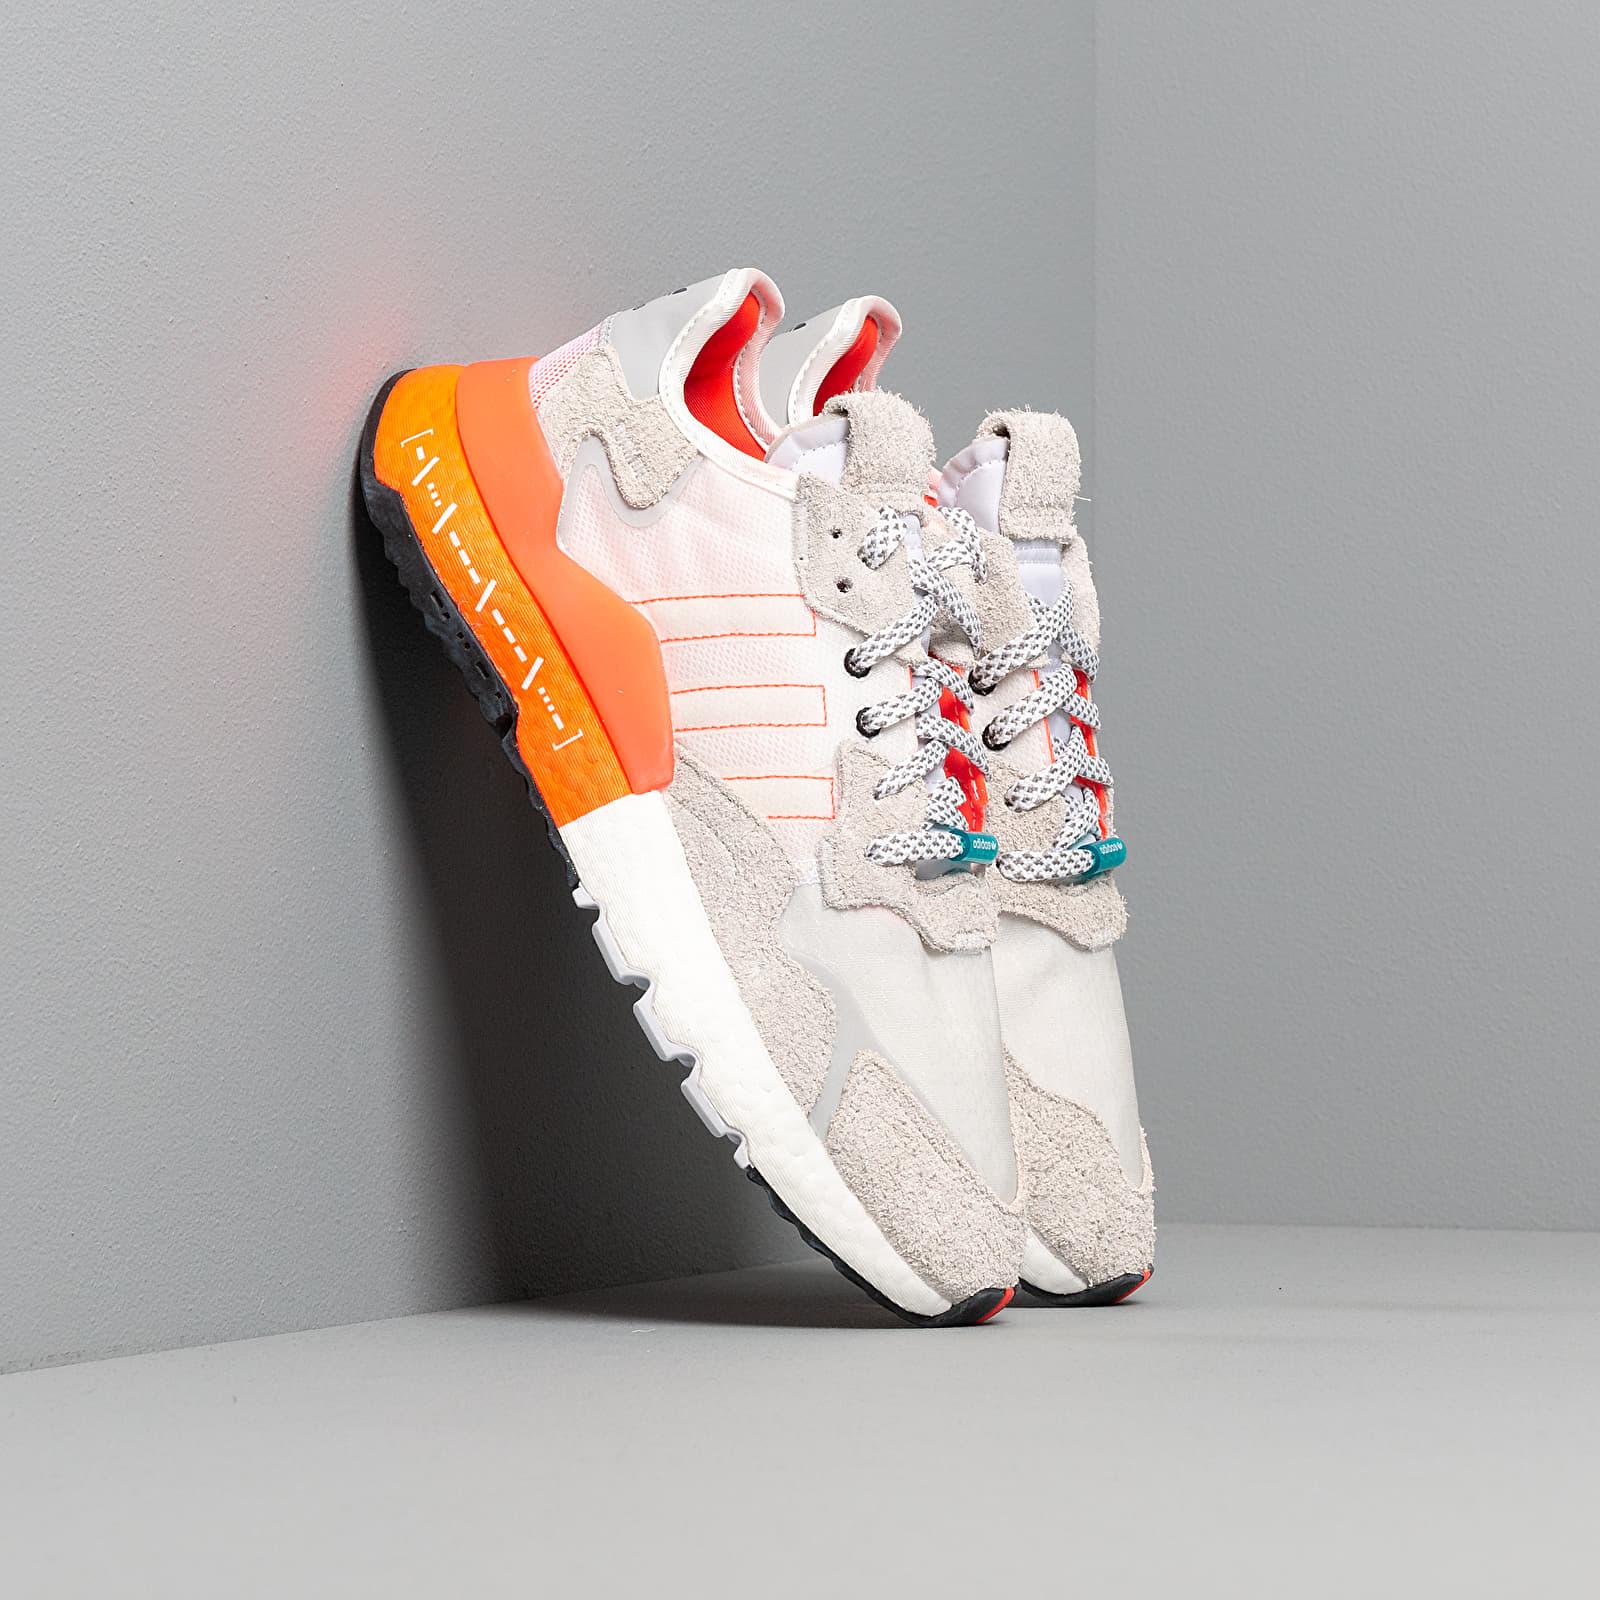 Men's shoes adidas Nite Jogger Ftwr